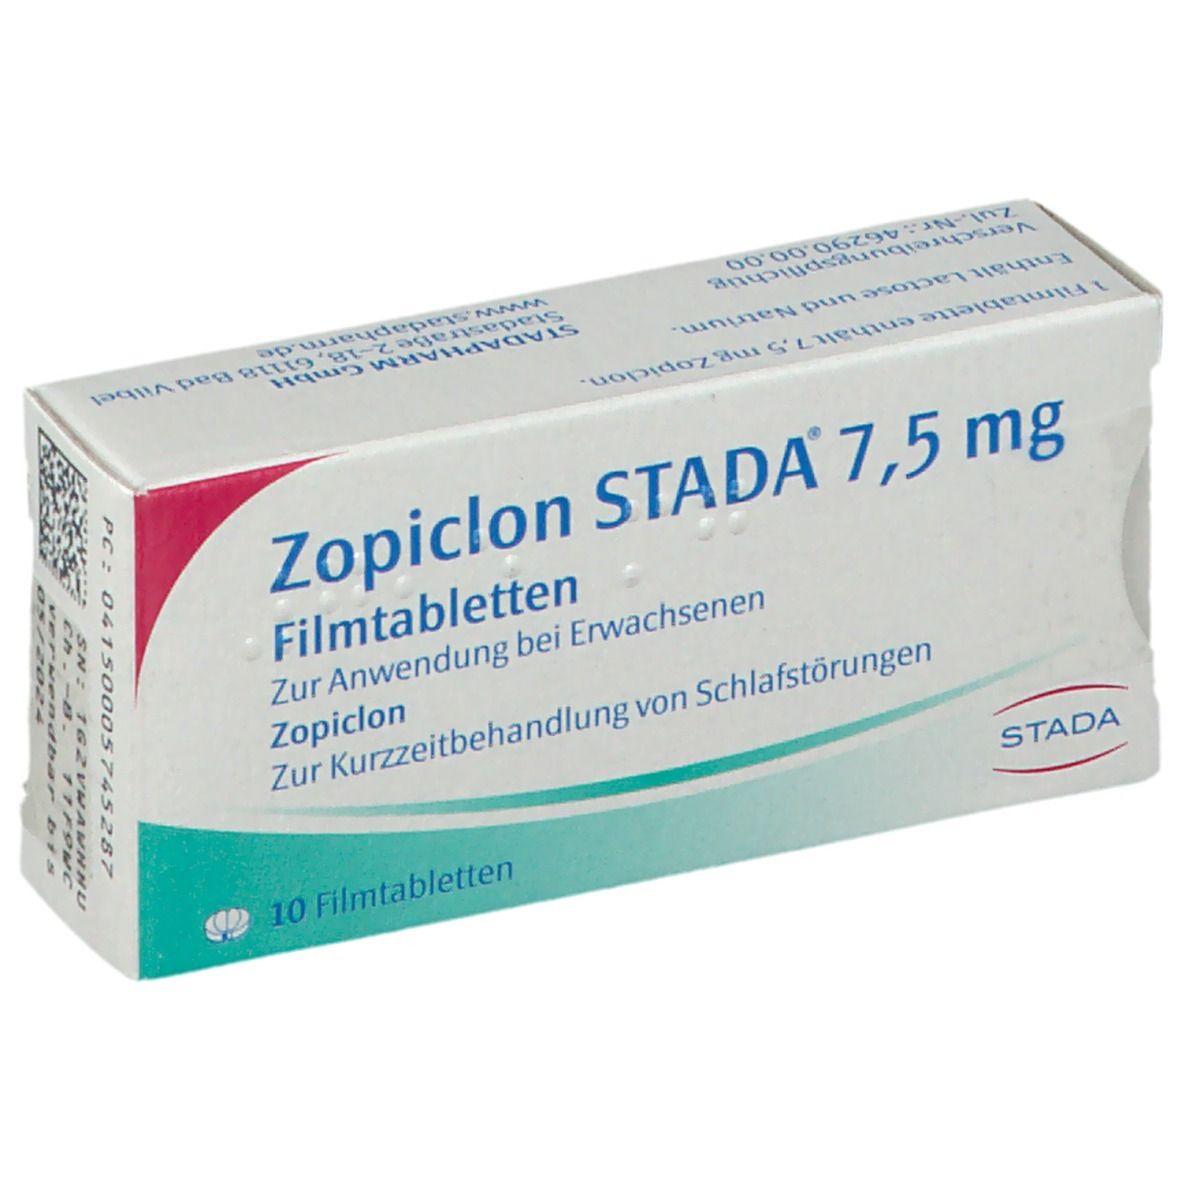 Zopiclon STADA® 7,5 mg